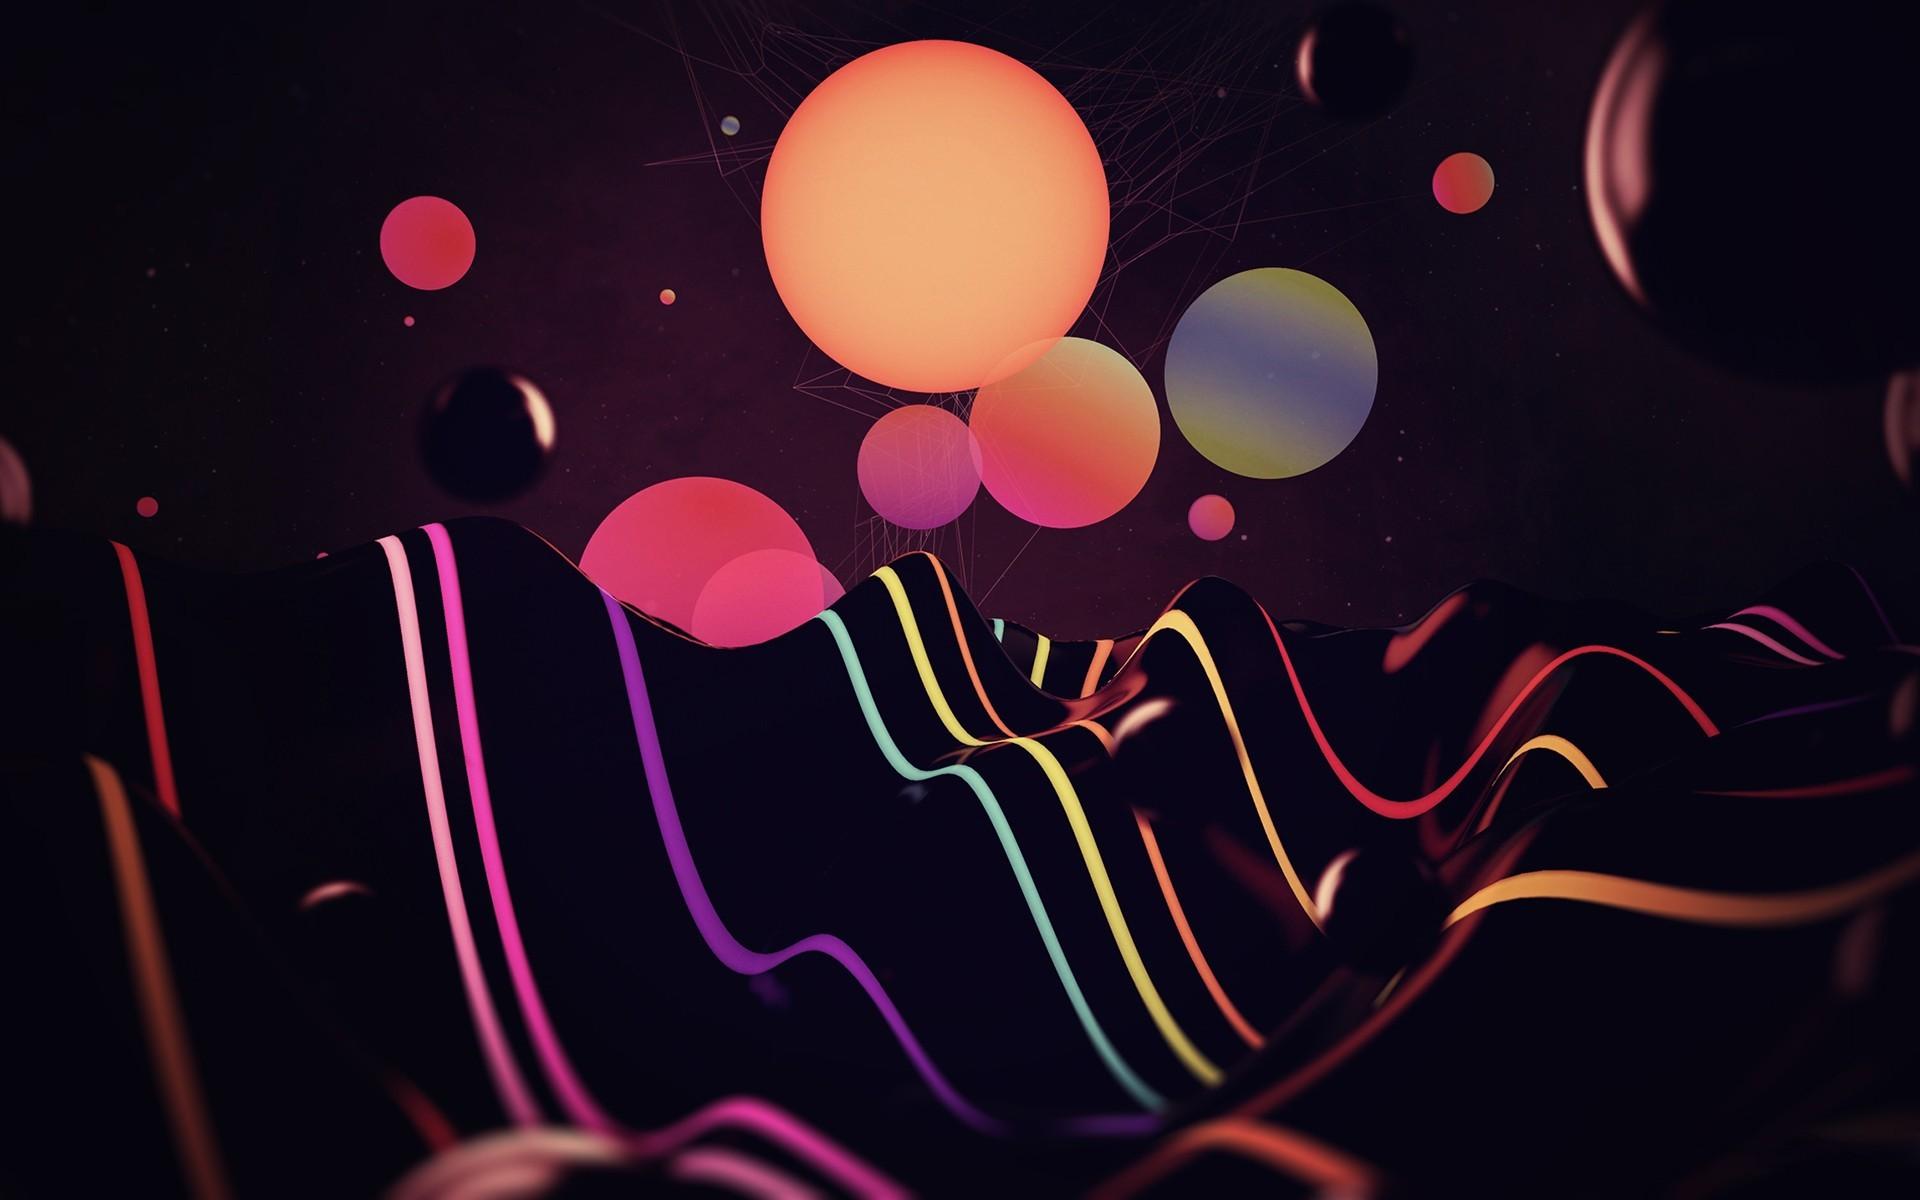 Portadas Para Facebook Originales De Colores Wwwmiifotoscom